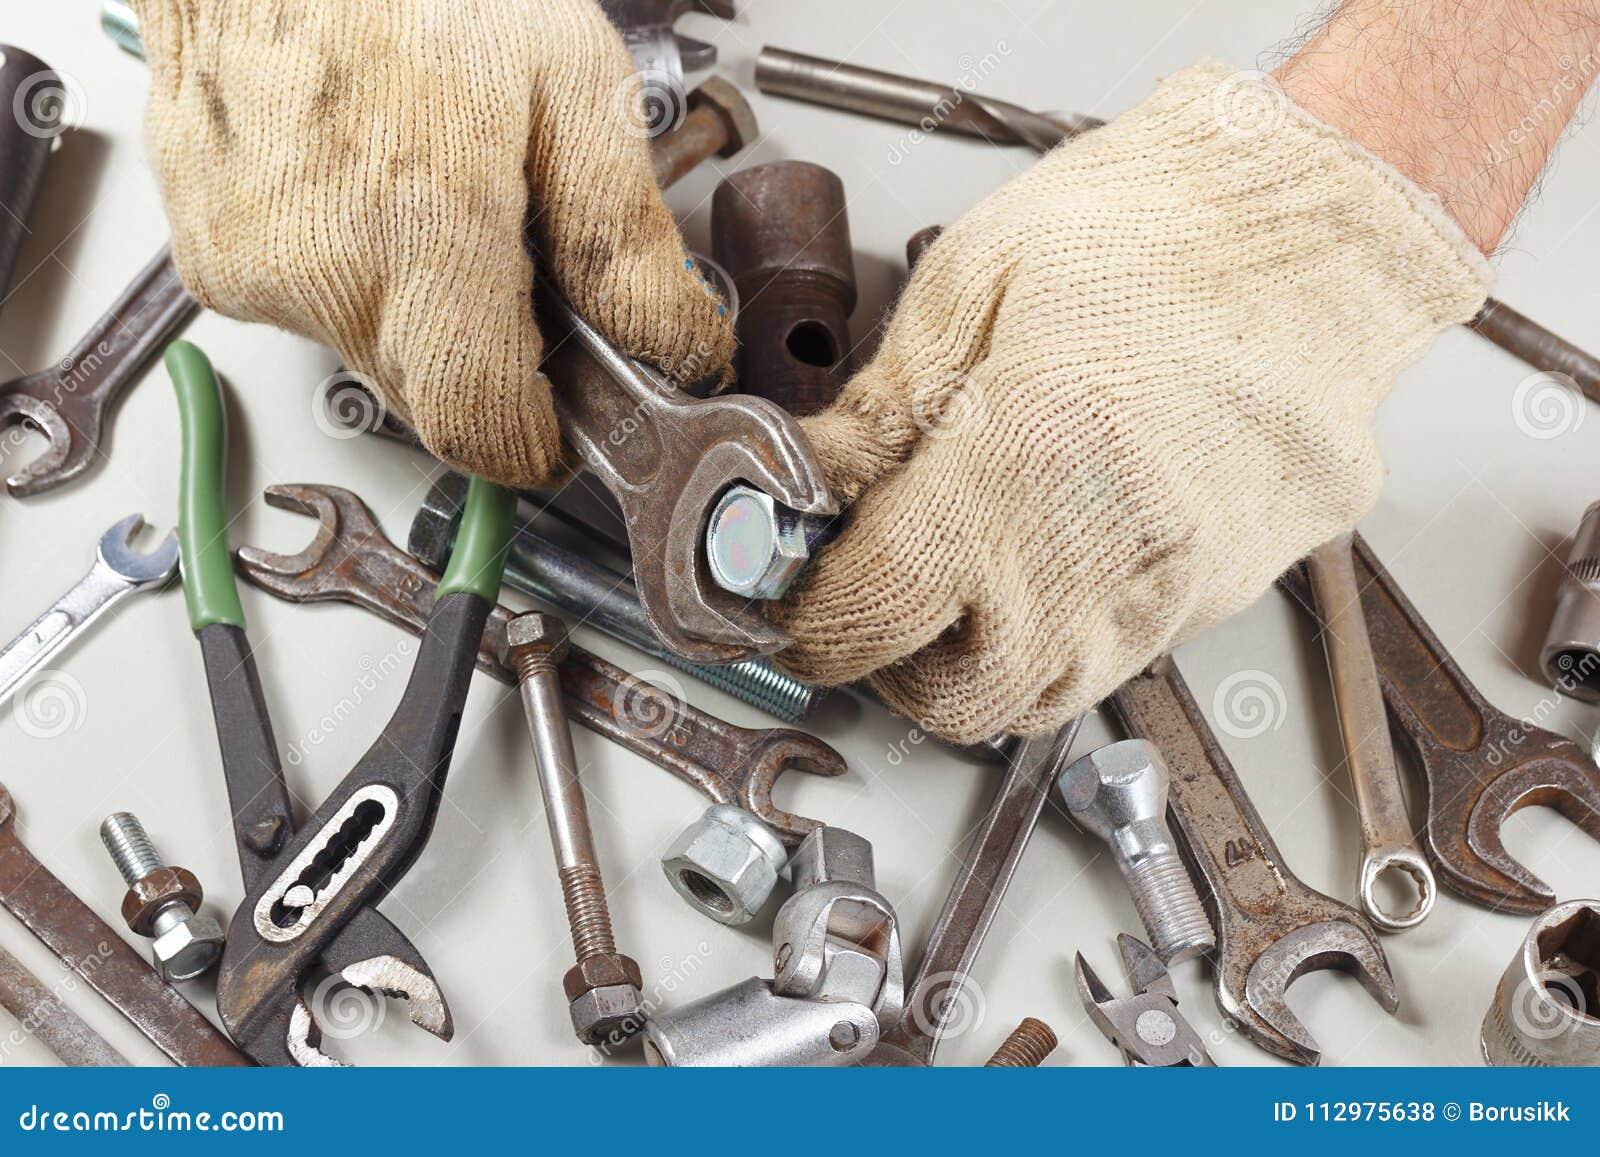 Hand of mechanic in gloves repairing parts of the mechanism in workshop